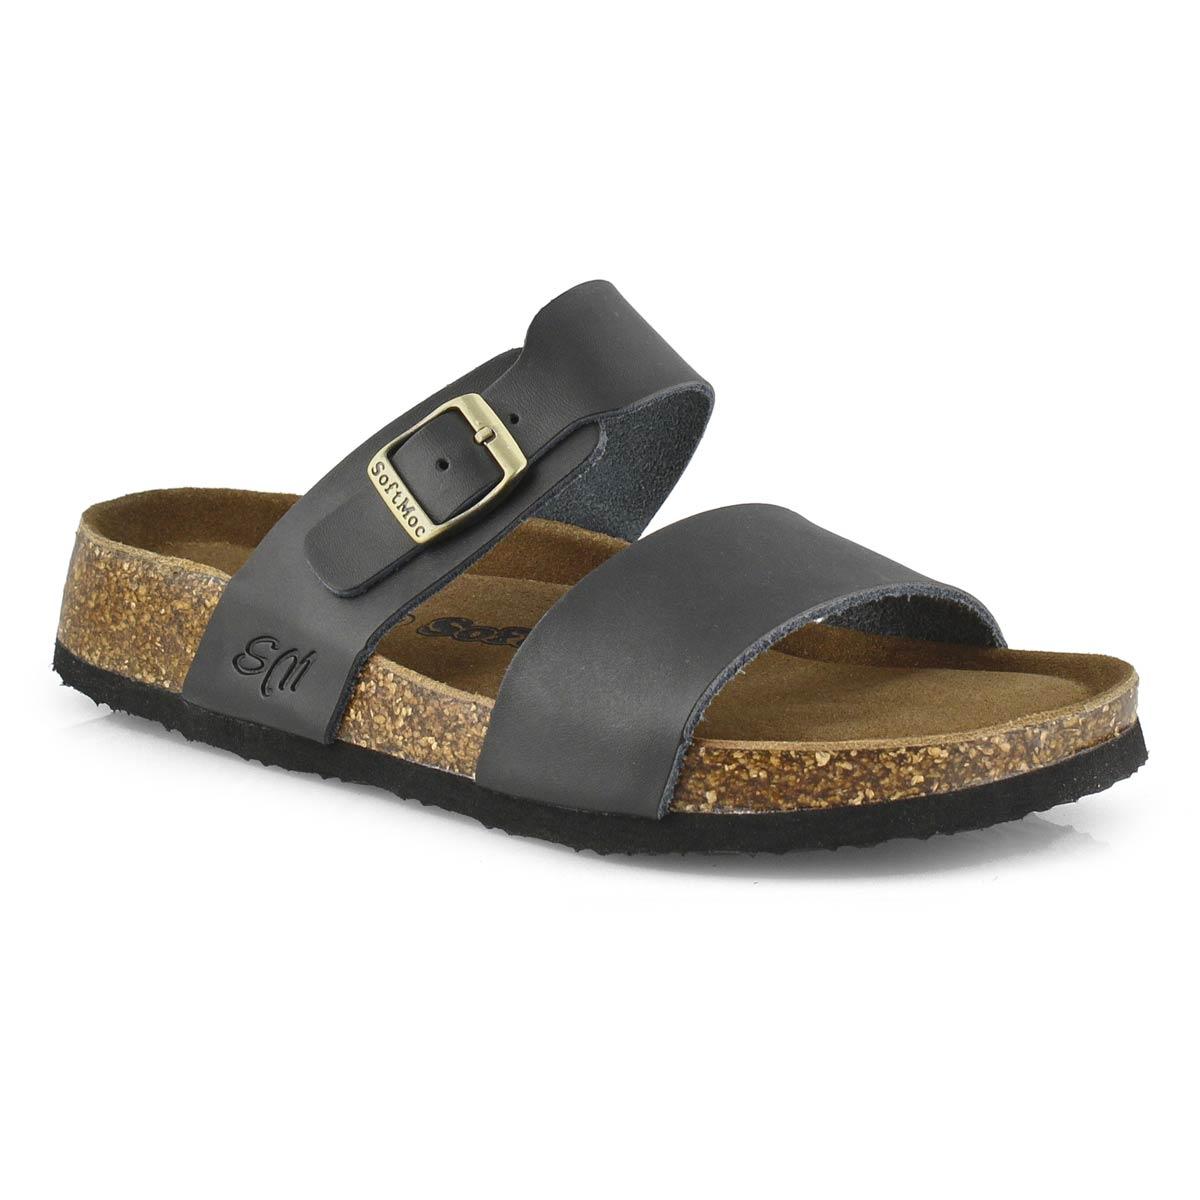 Women's ARIANNA 5 black memory foam slide sandals